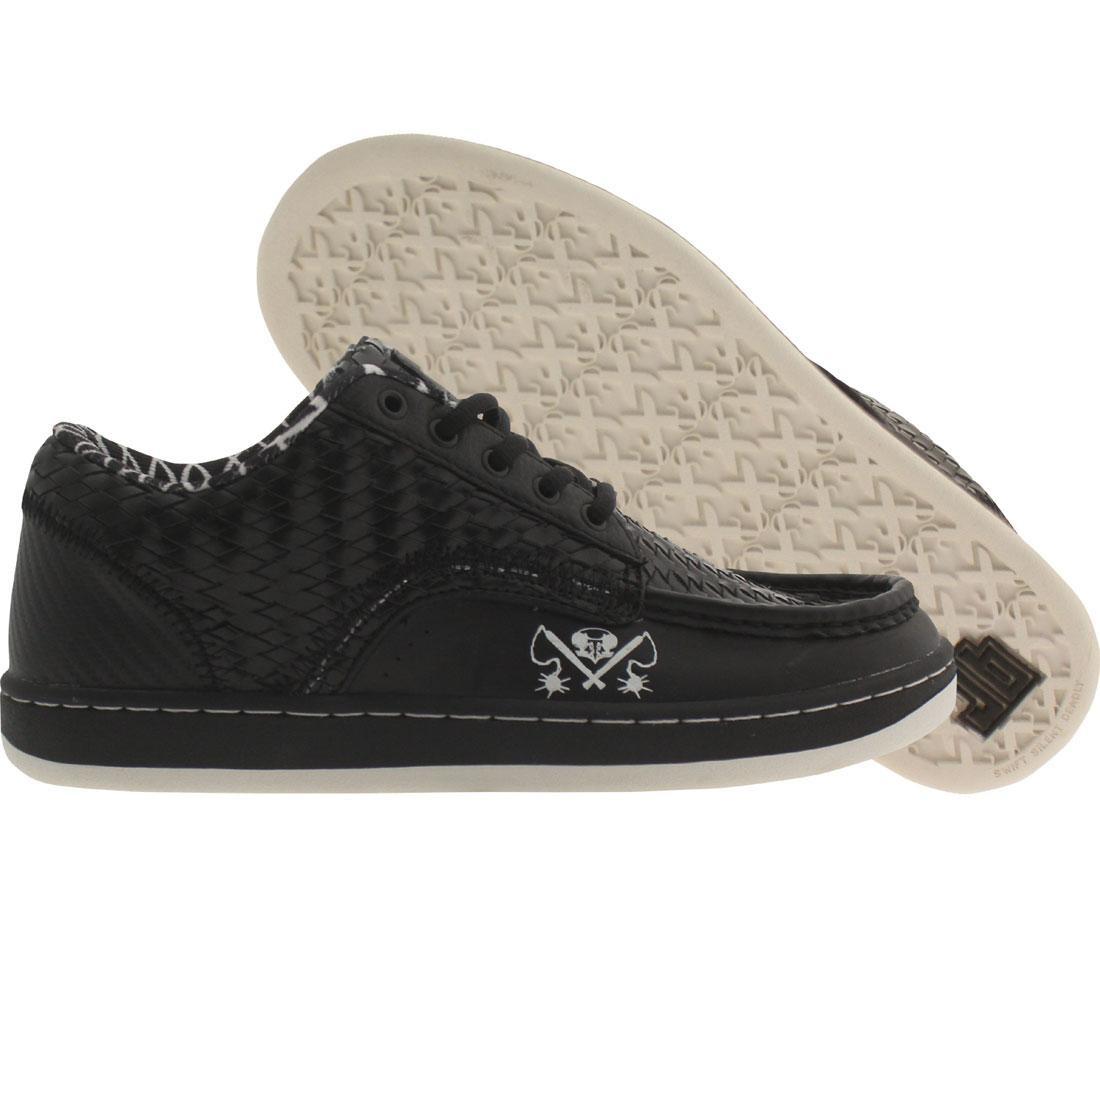 【海外限定】メンズ靴 靴 【 JB CLASSICS SDM LOW MACE BLACK HERRINGBONE WHITE 】